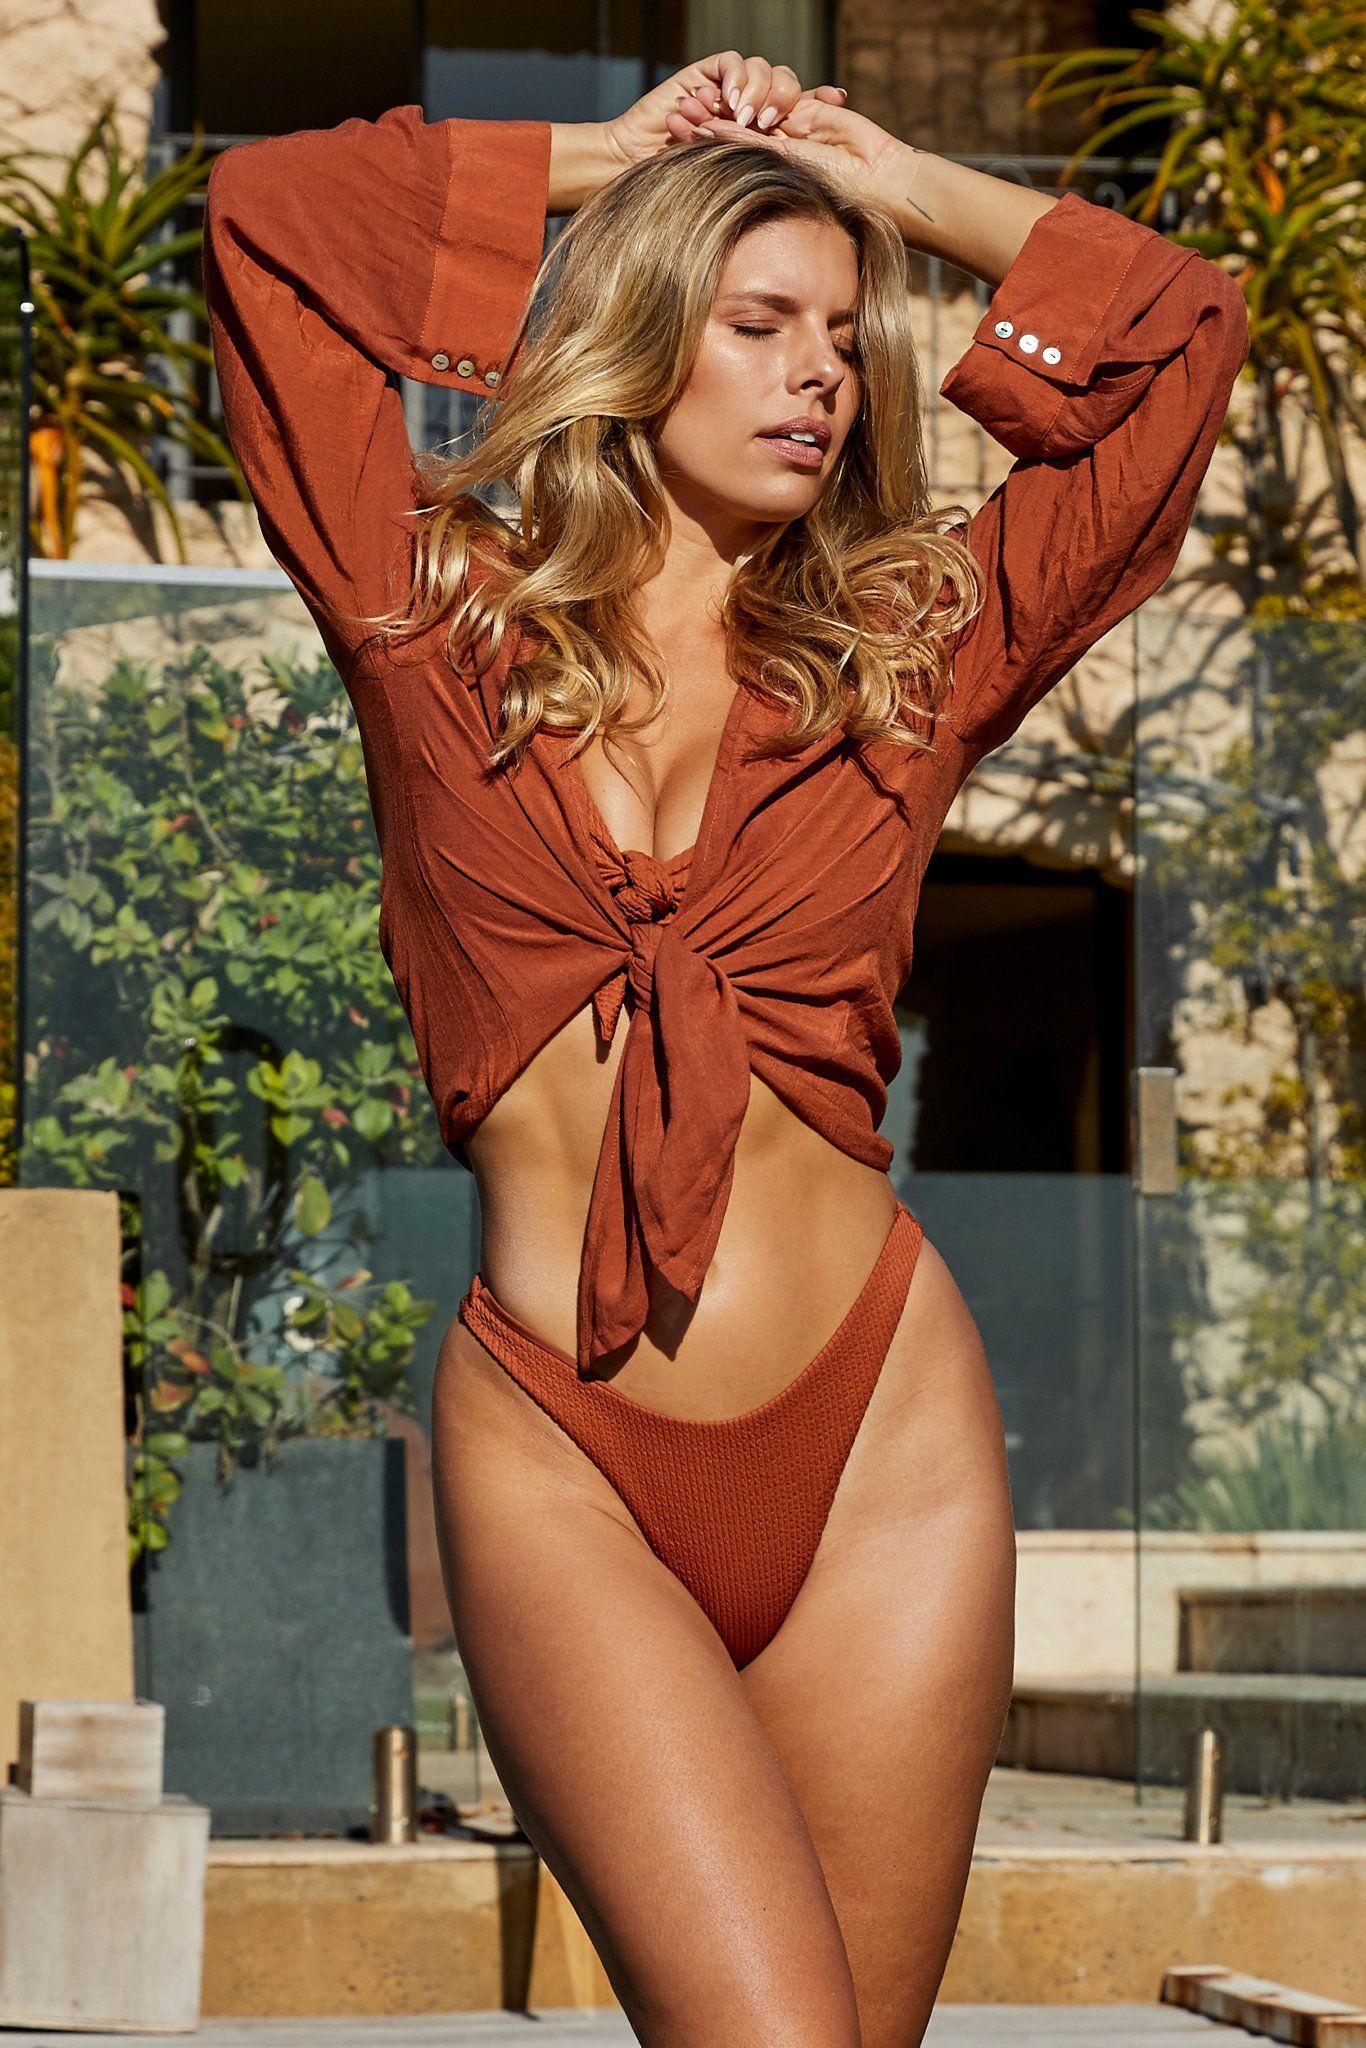 Tahiti Tie Top by Monday Swimwear, available on mondayswimwear.com for $89 Natasha Oakley Outerwear Exact Product